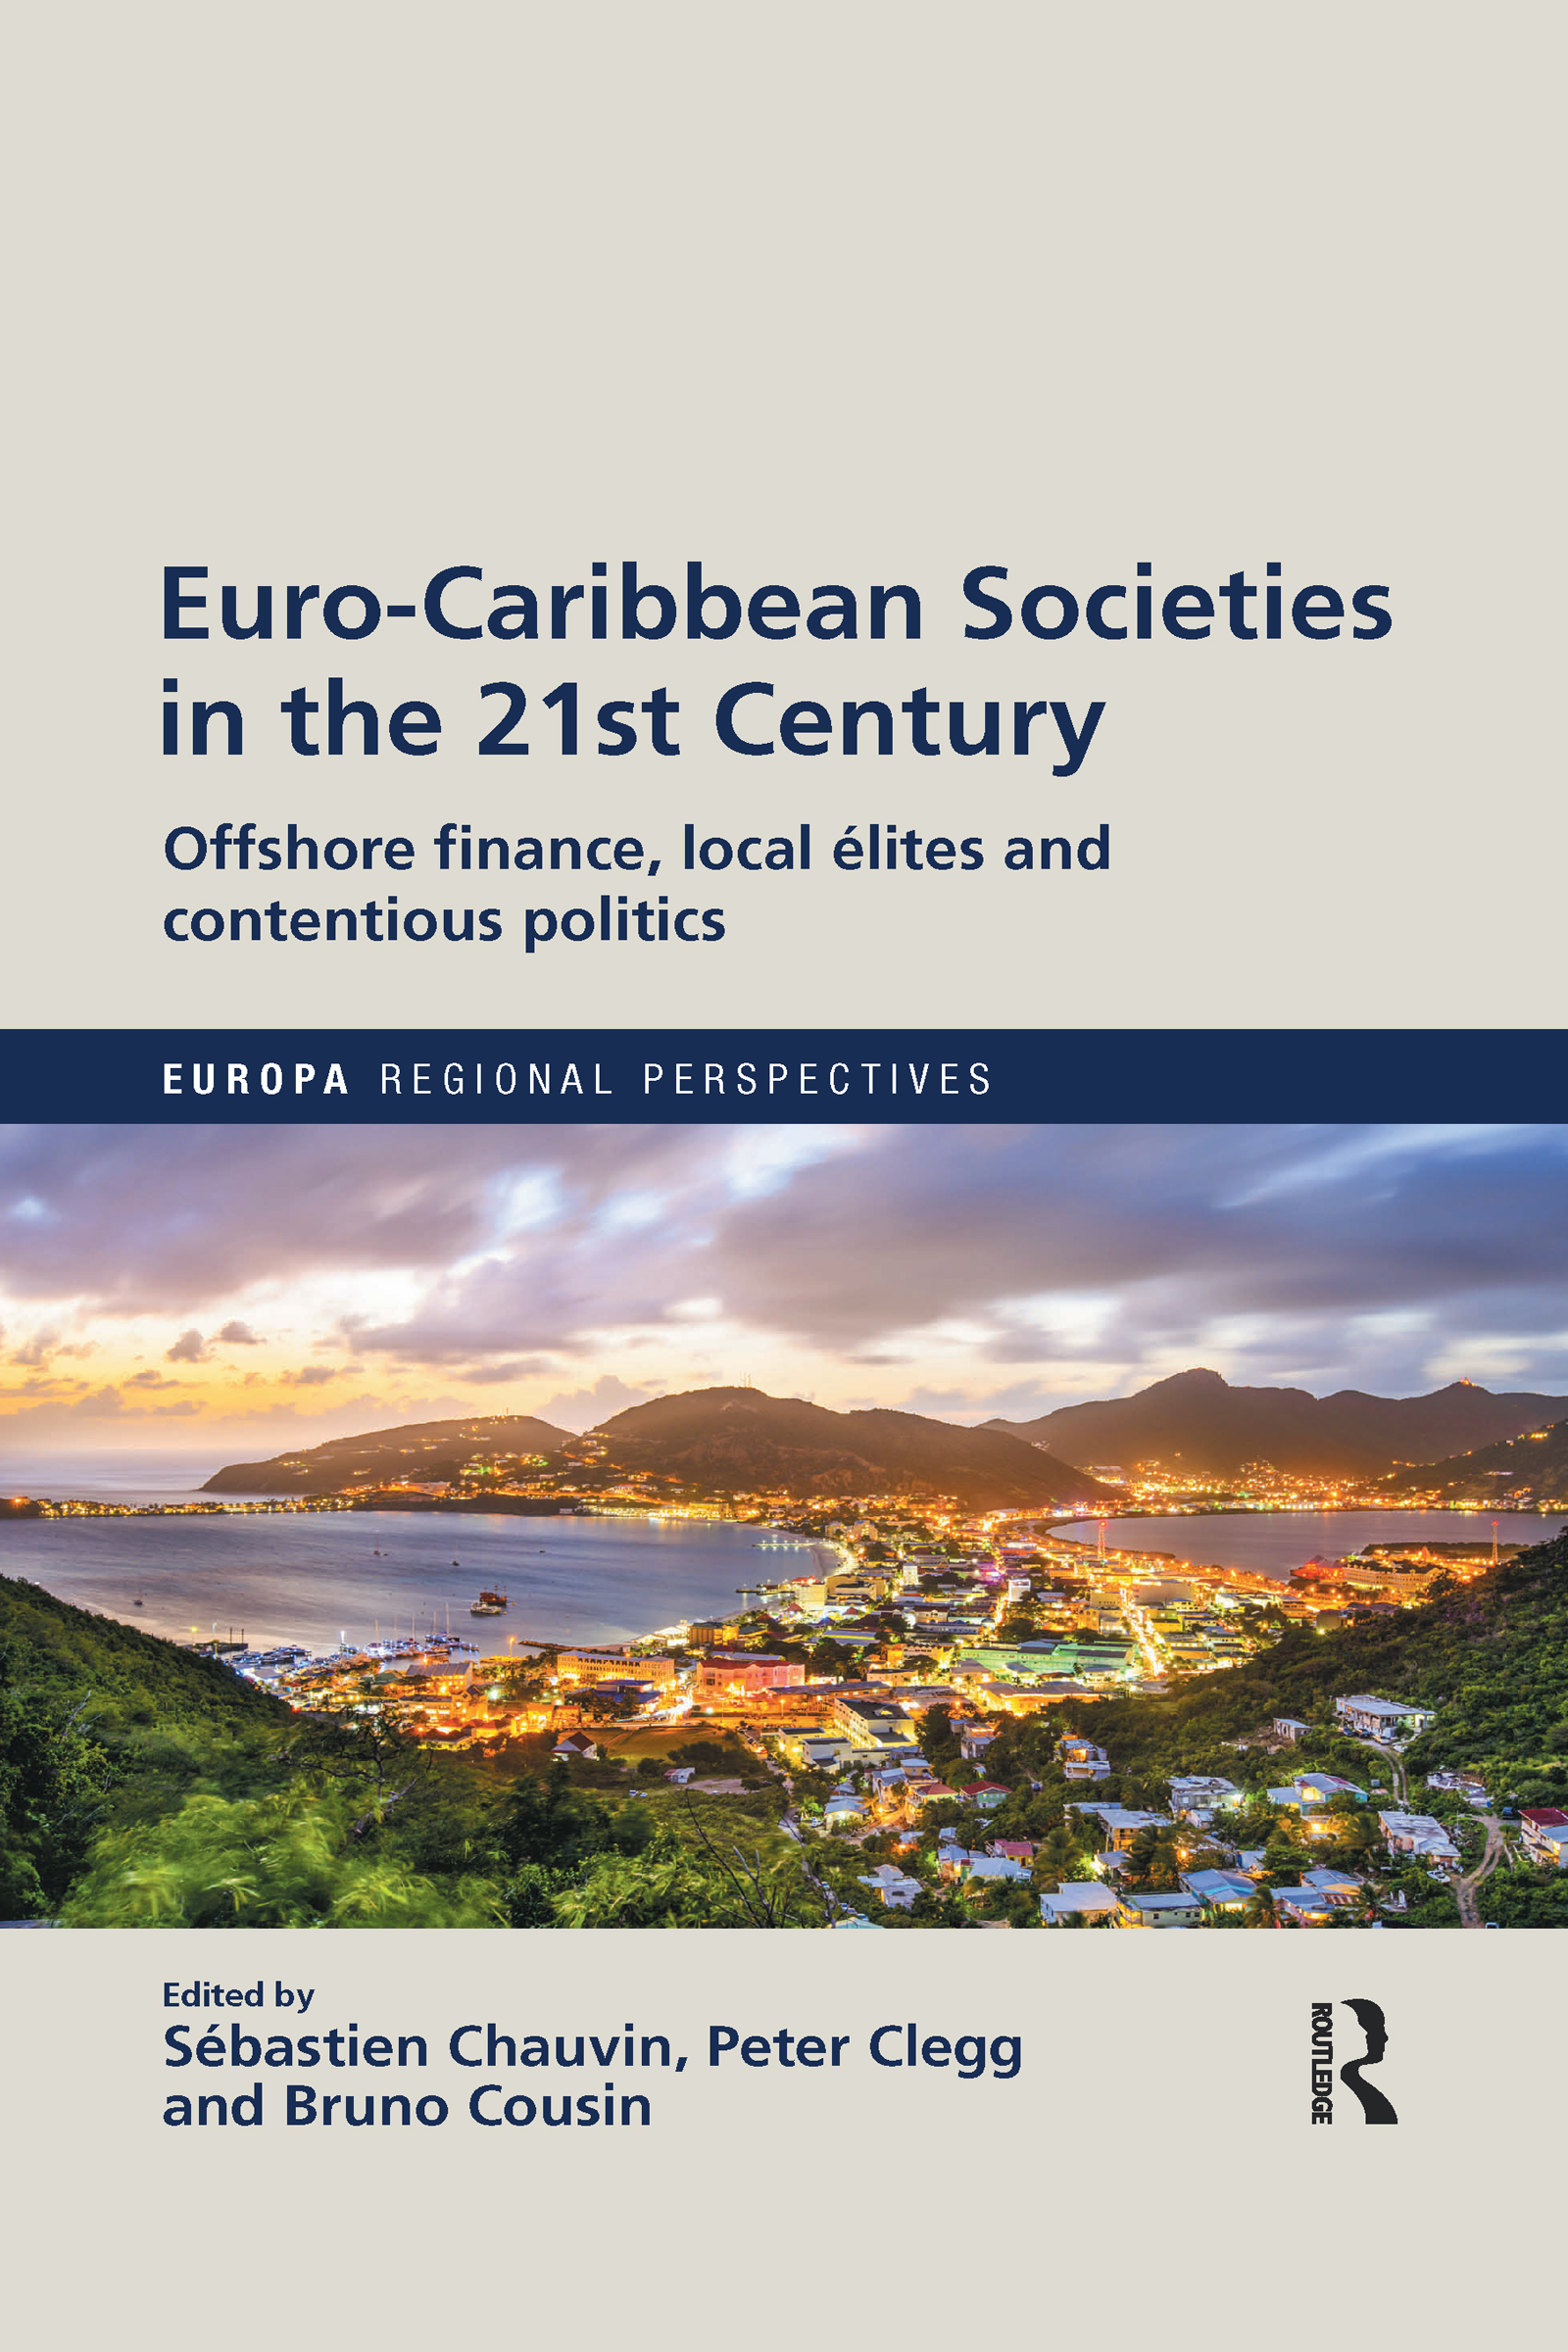 Euro-Caribbean Societies in the 21st Century